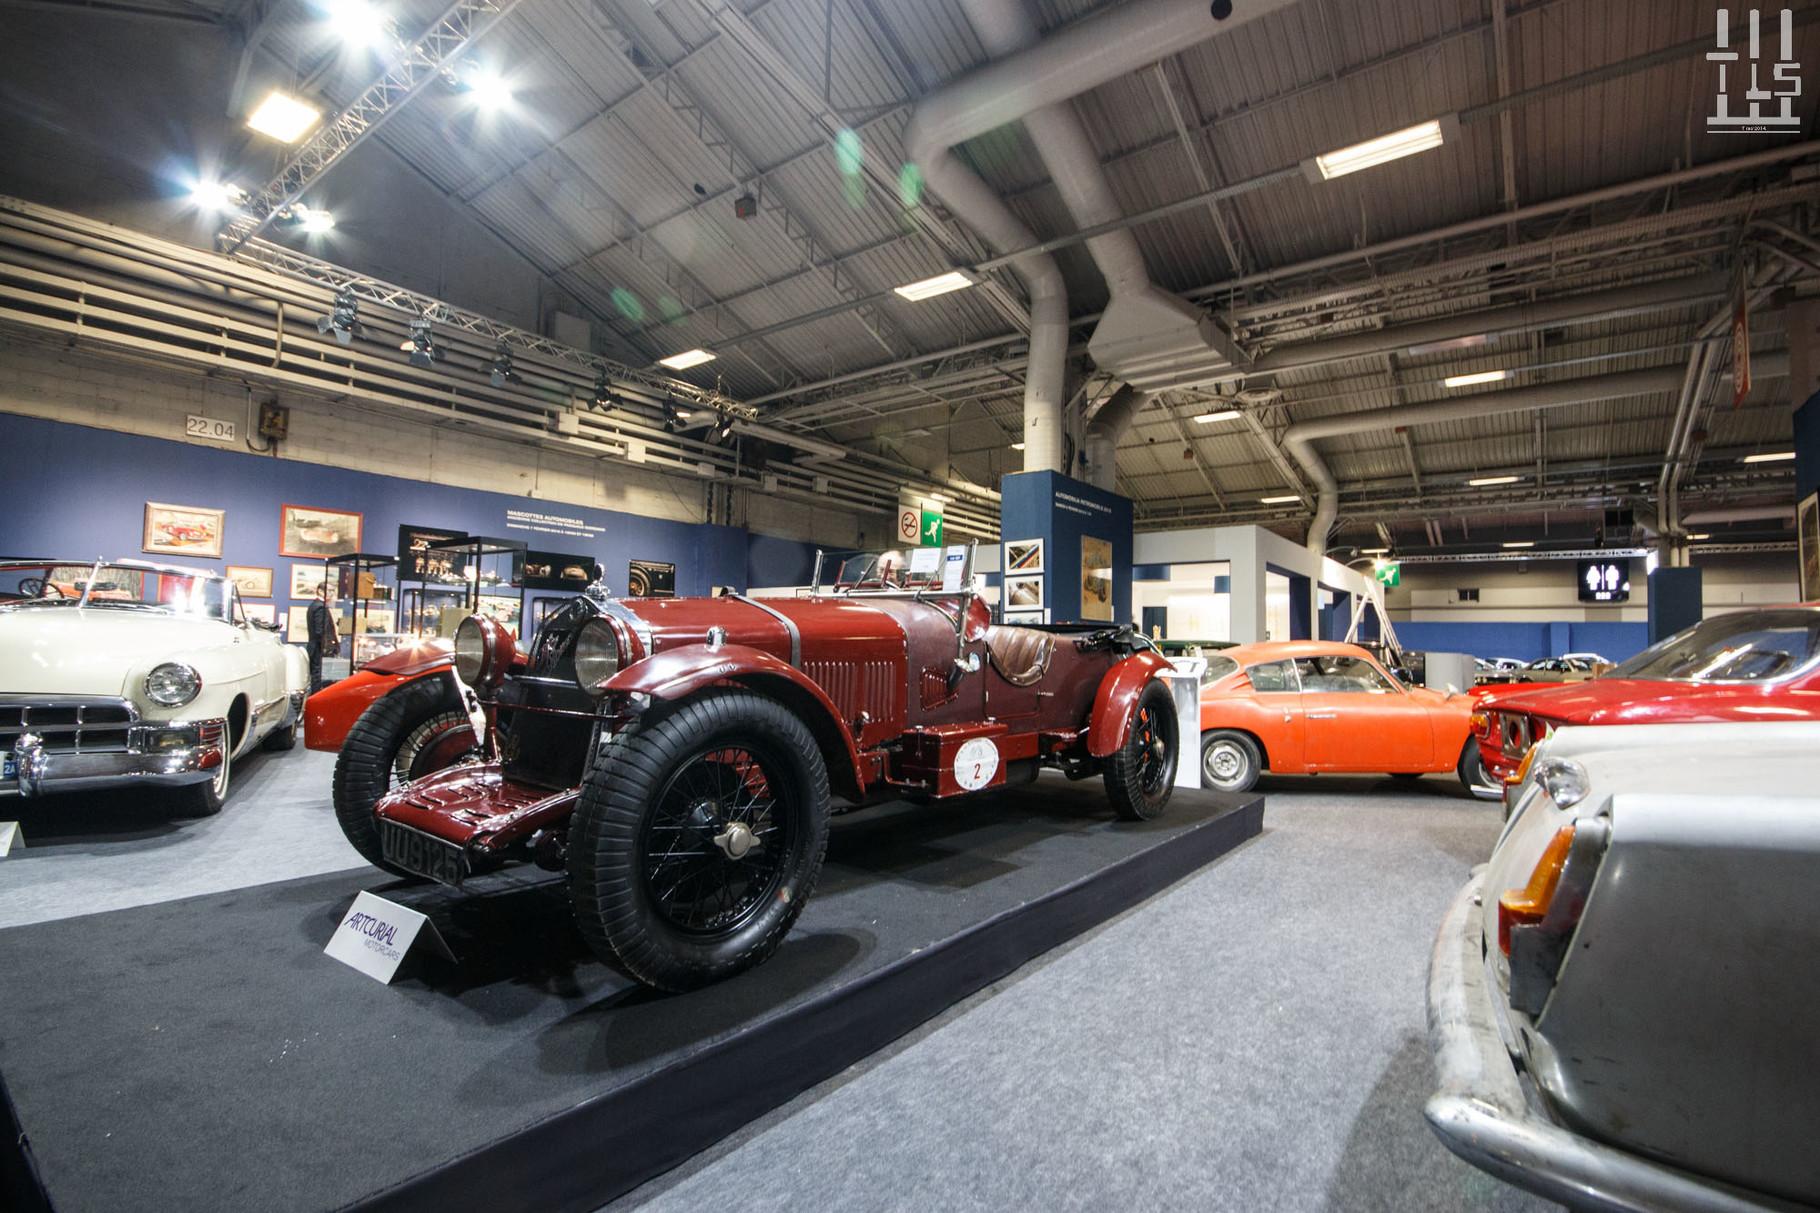 Alfa Romeo 6C 1750 Super Sport : estimée entre 1 350 000 et 1 550 000 euros, invendue.